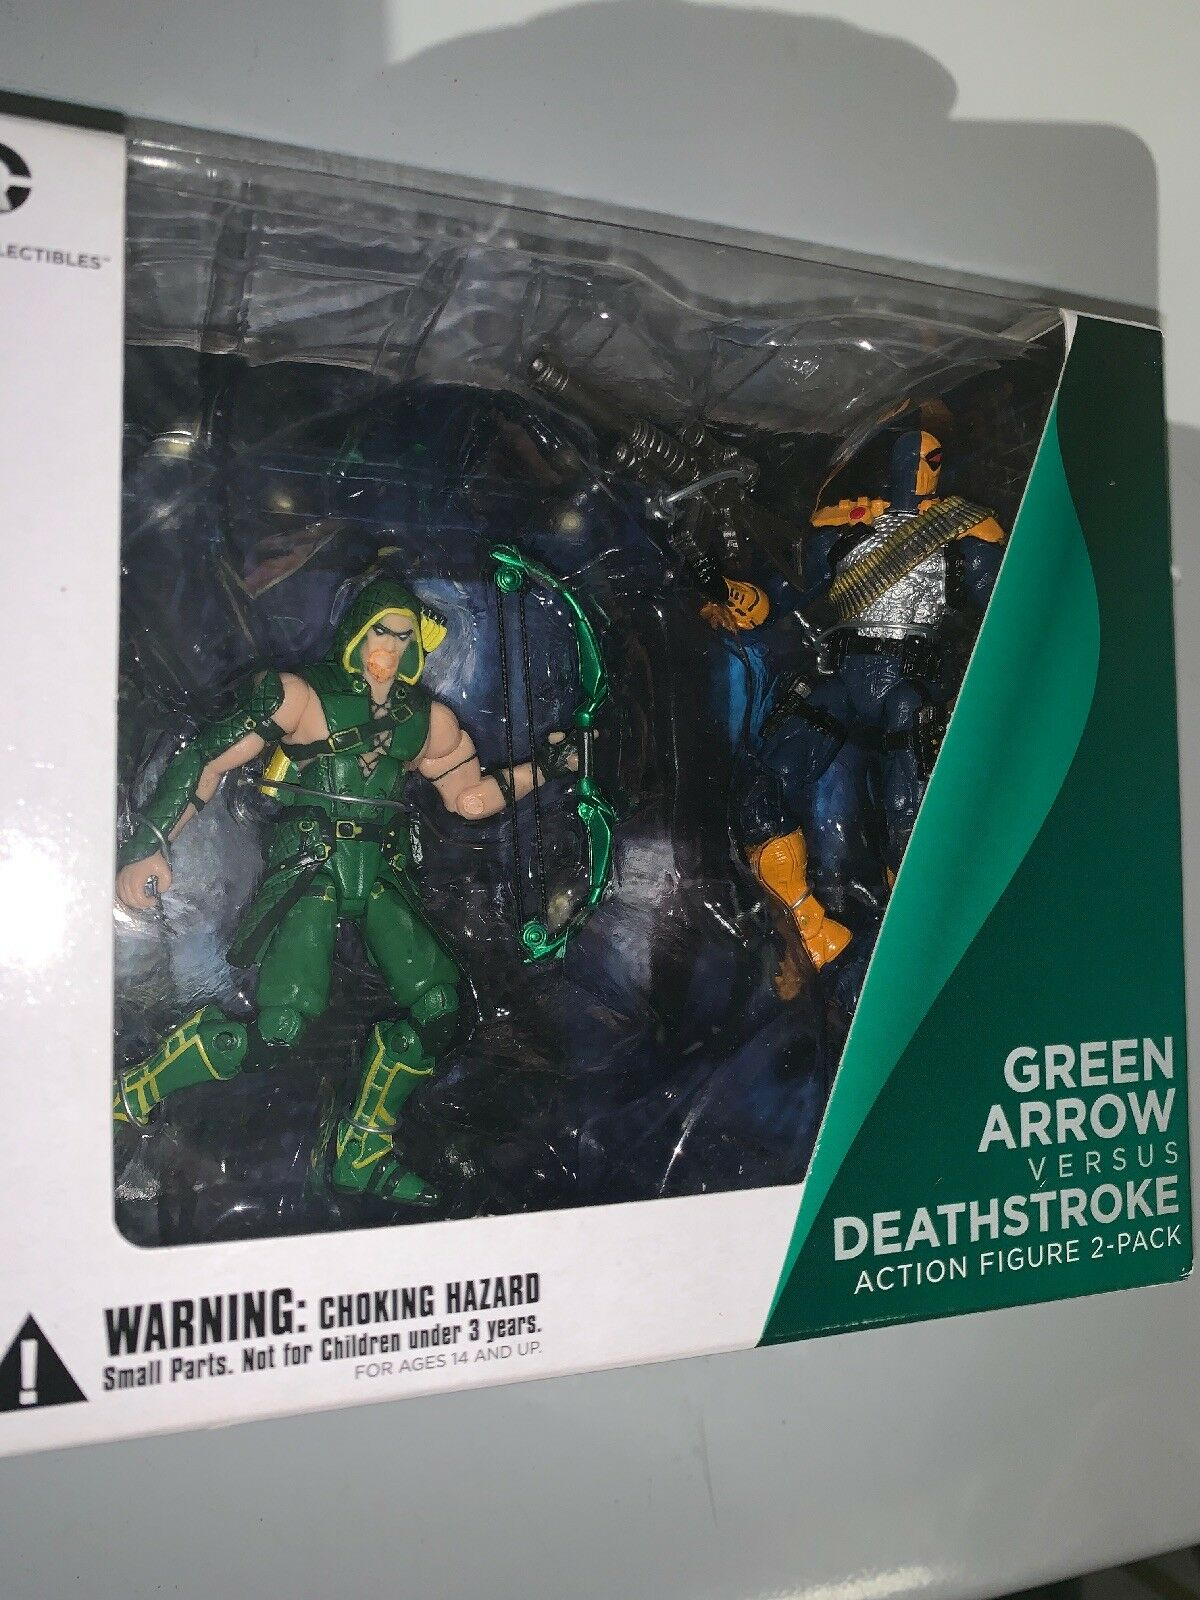 Diamond Comic DC Collectibles Injustice Deathstroke verde Arrow Action Figures